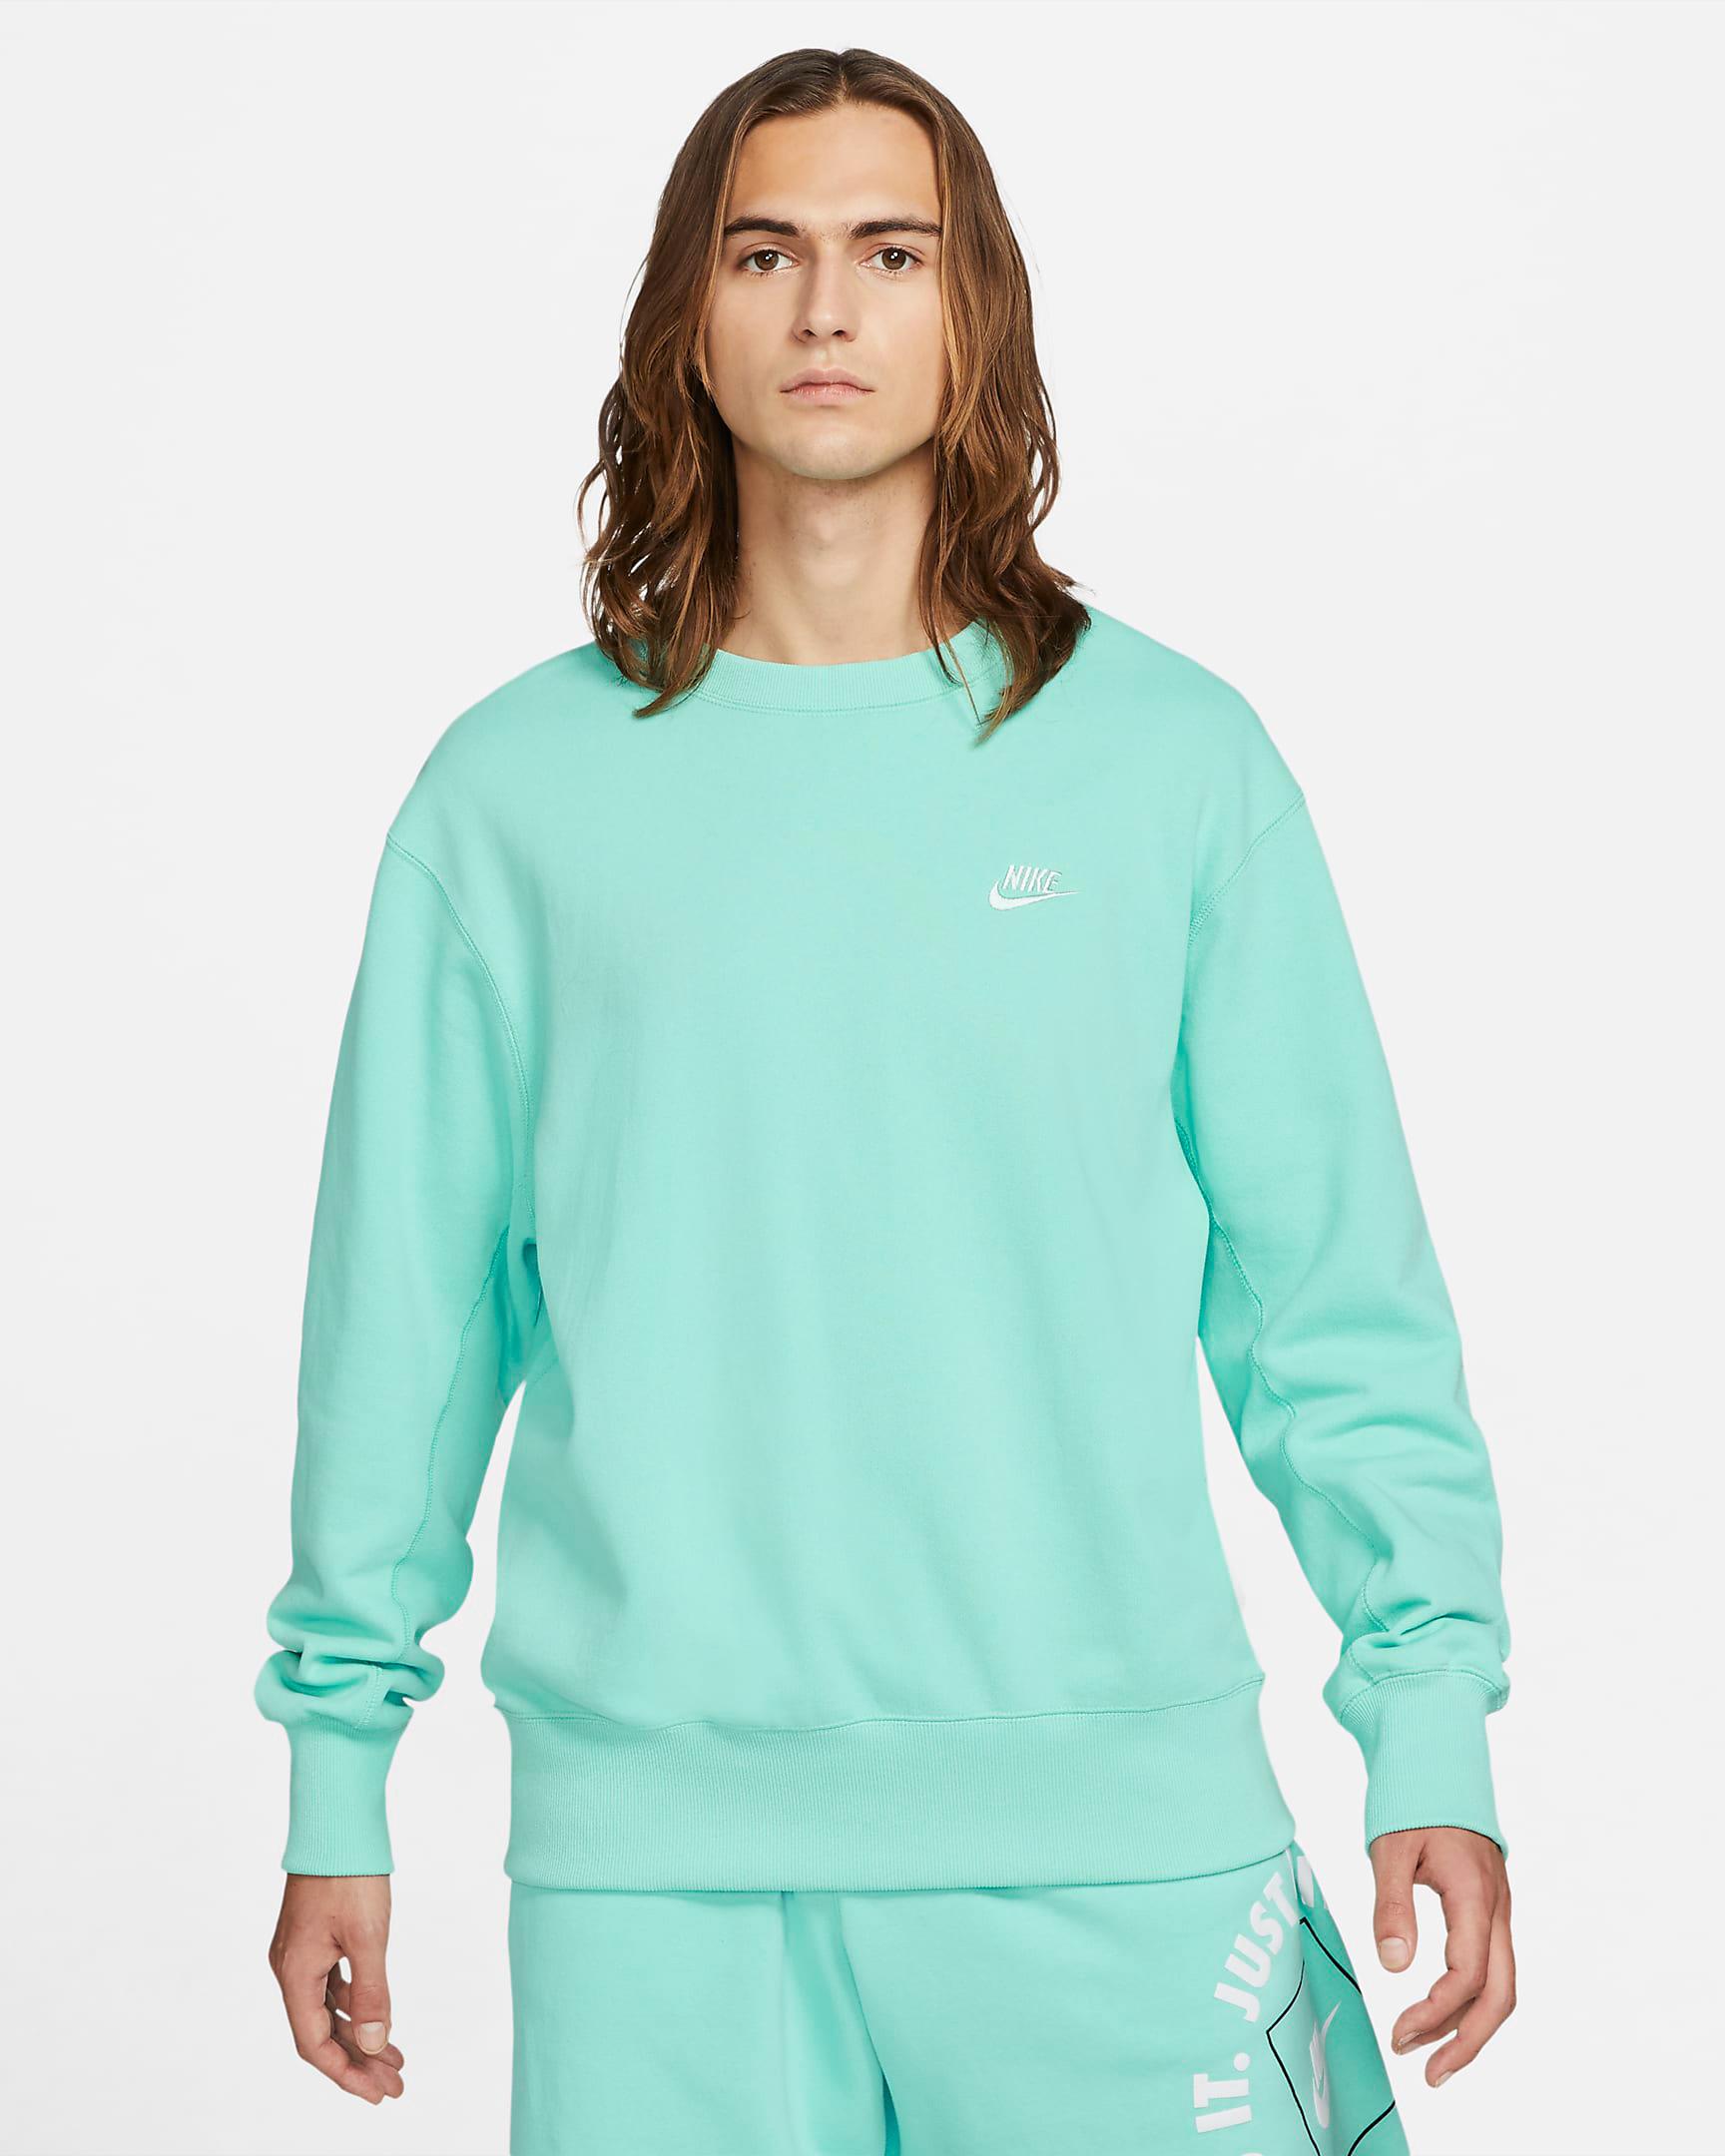 nike-light-dew-classic-fleece-crew-sweatshirt